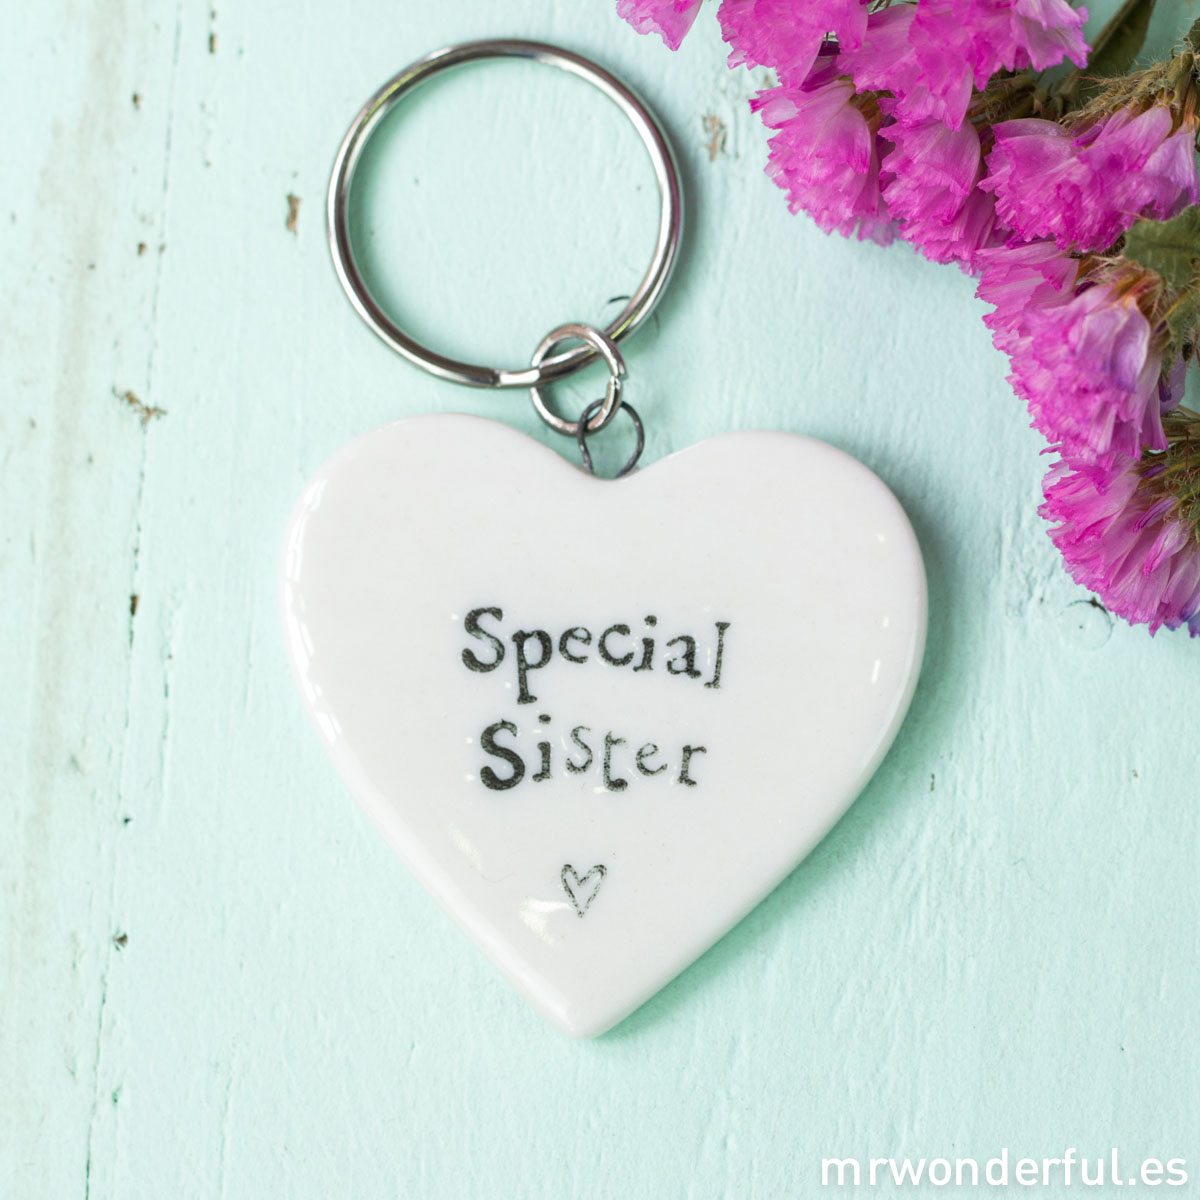 mrwonderful_163_llavero-corazon-porcelana_ special-sister-2-2